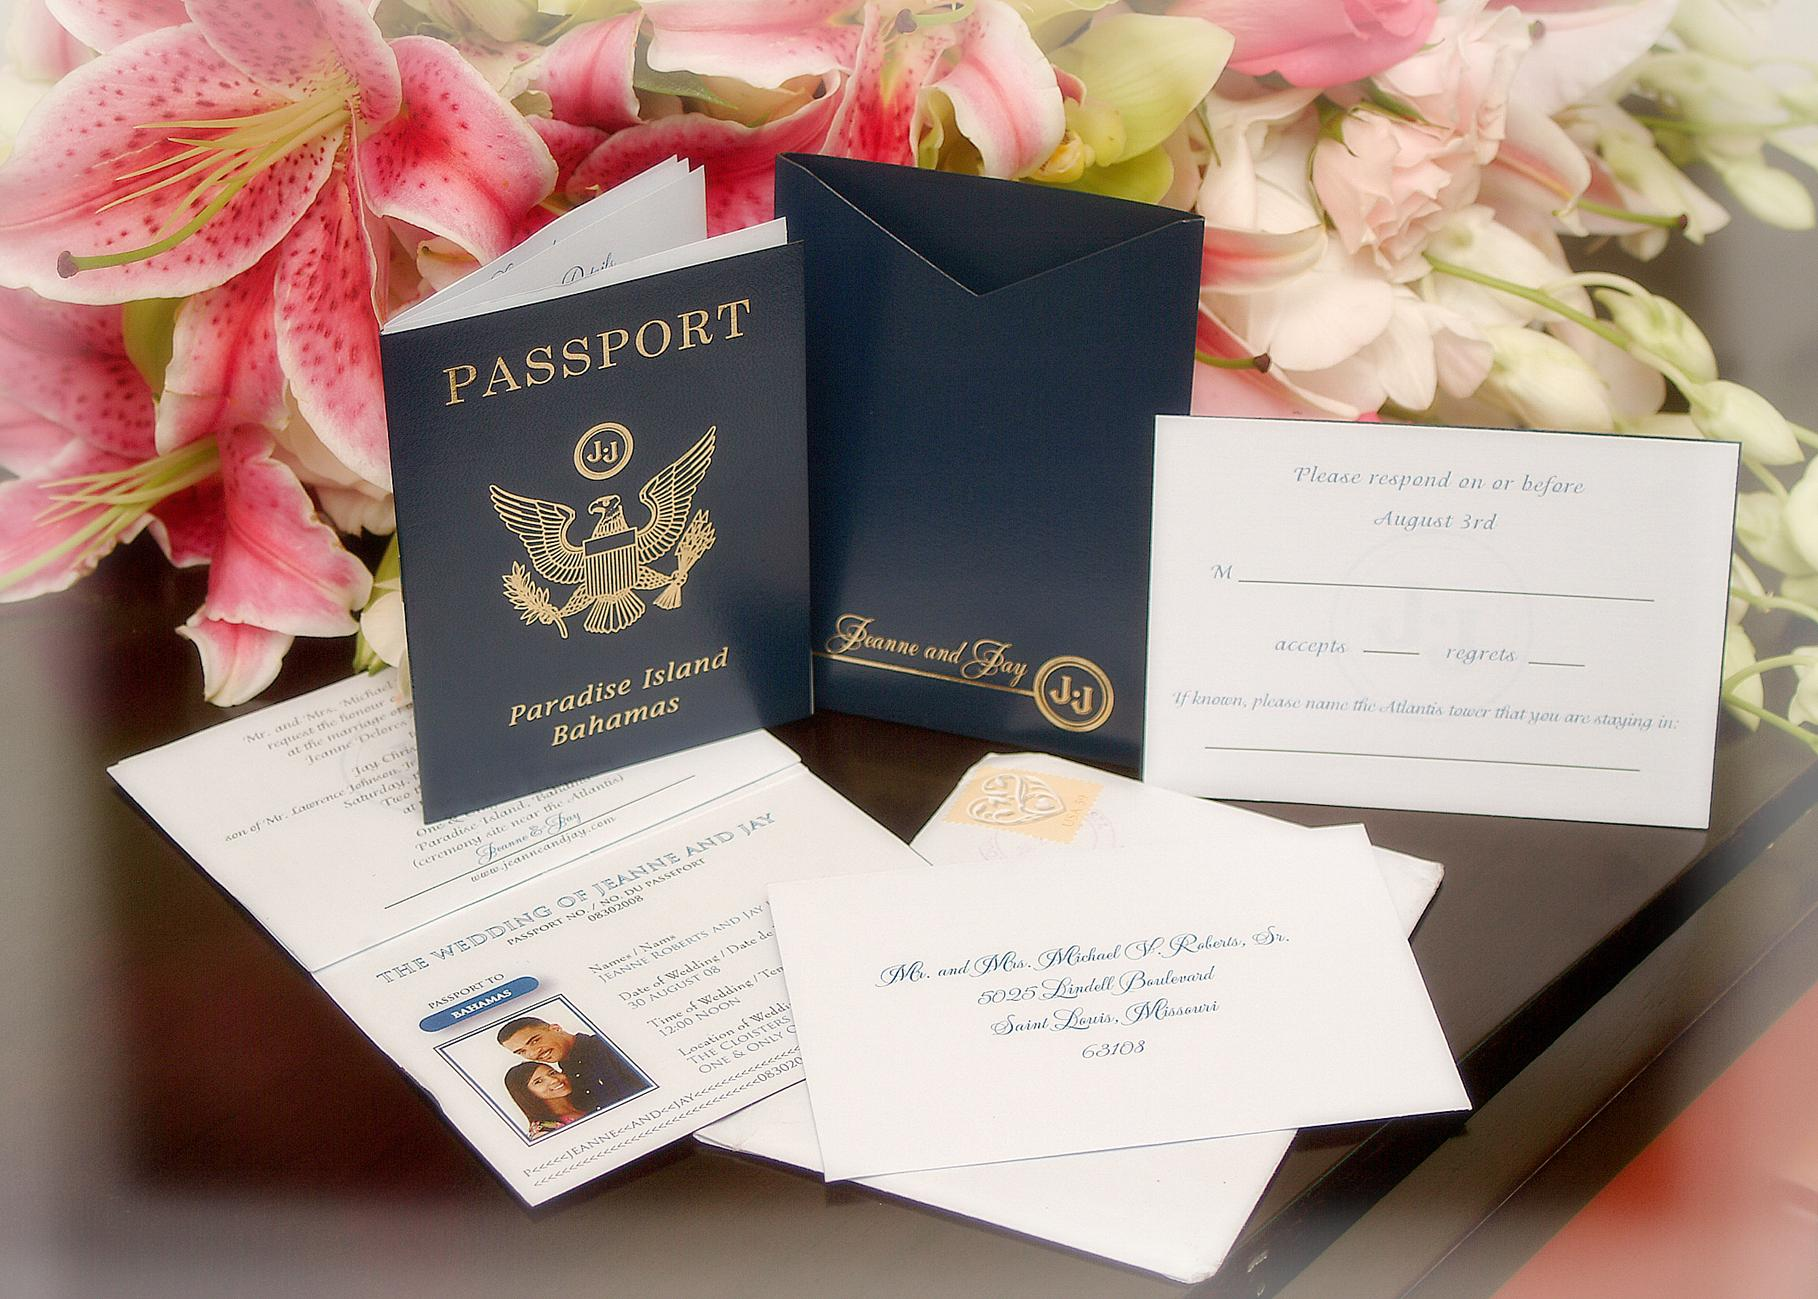 passport invitations for destination wedding in the bahamas